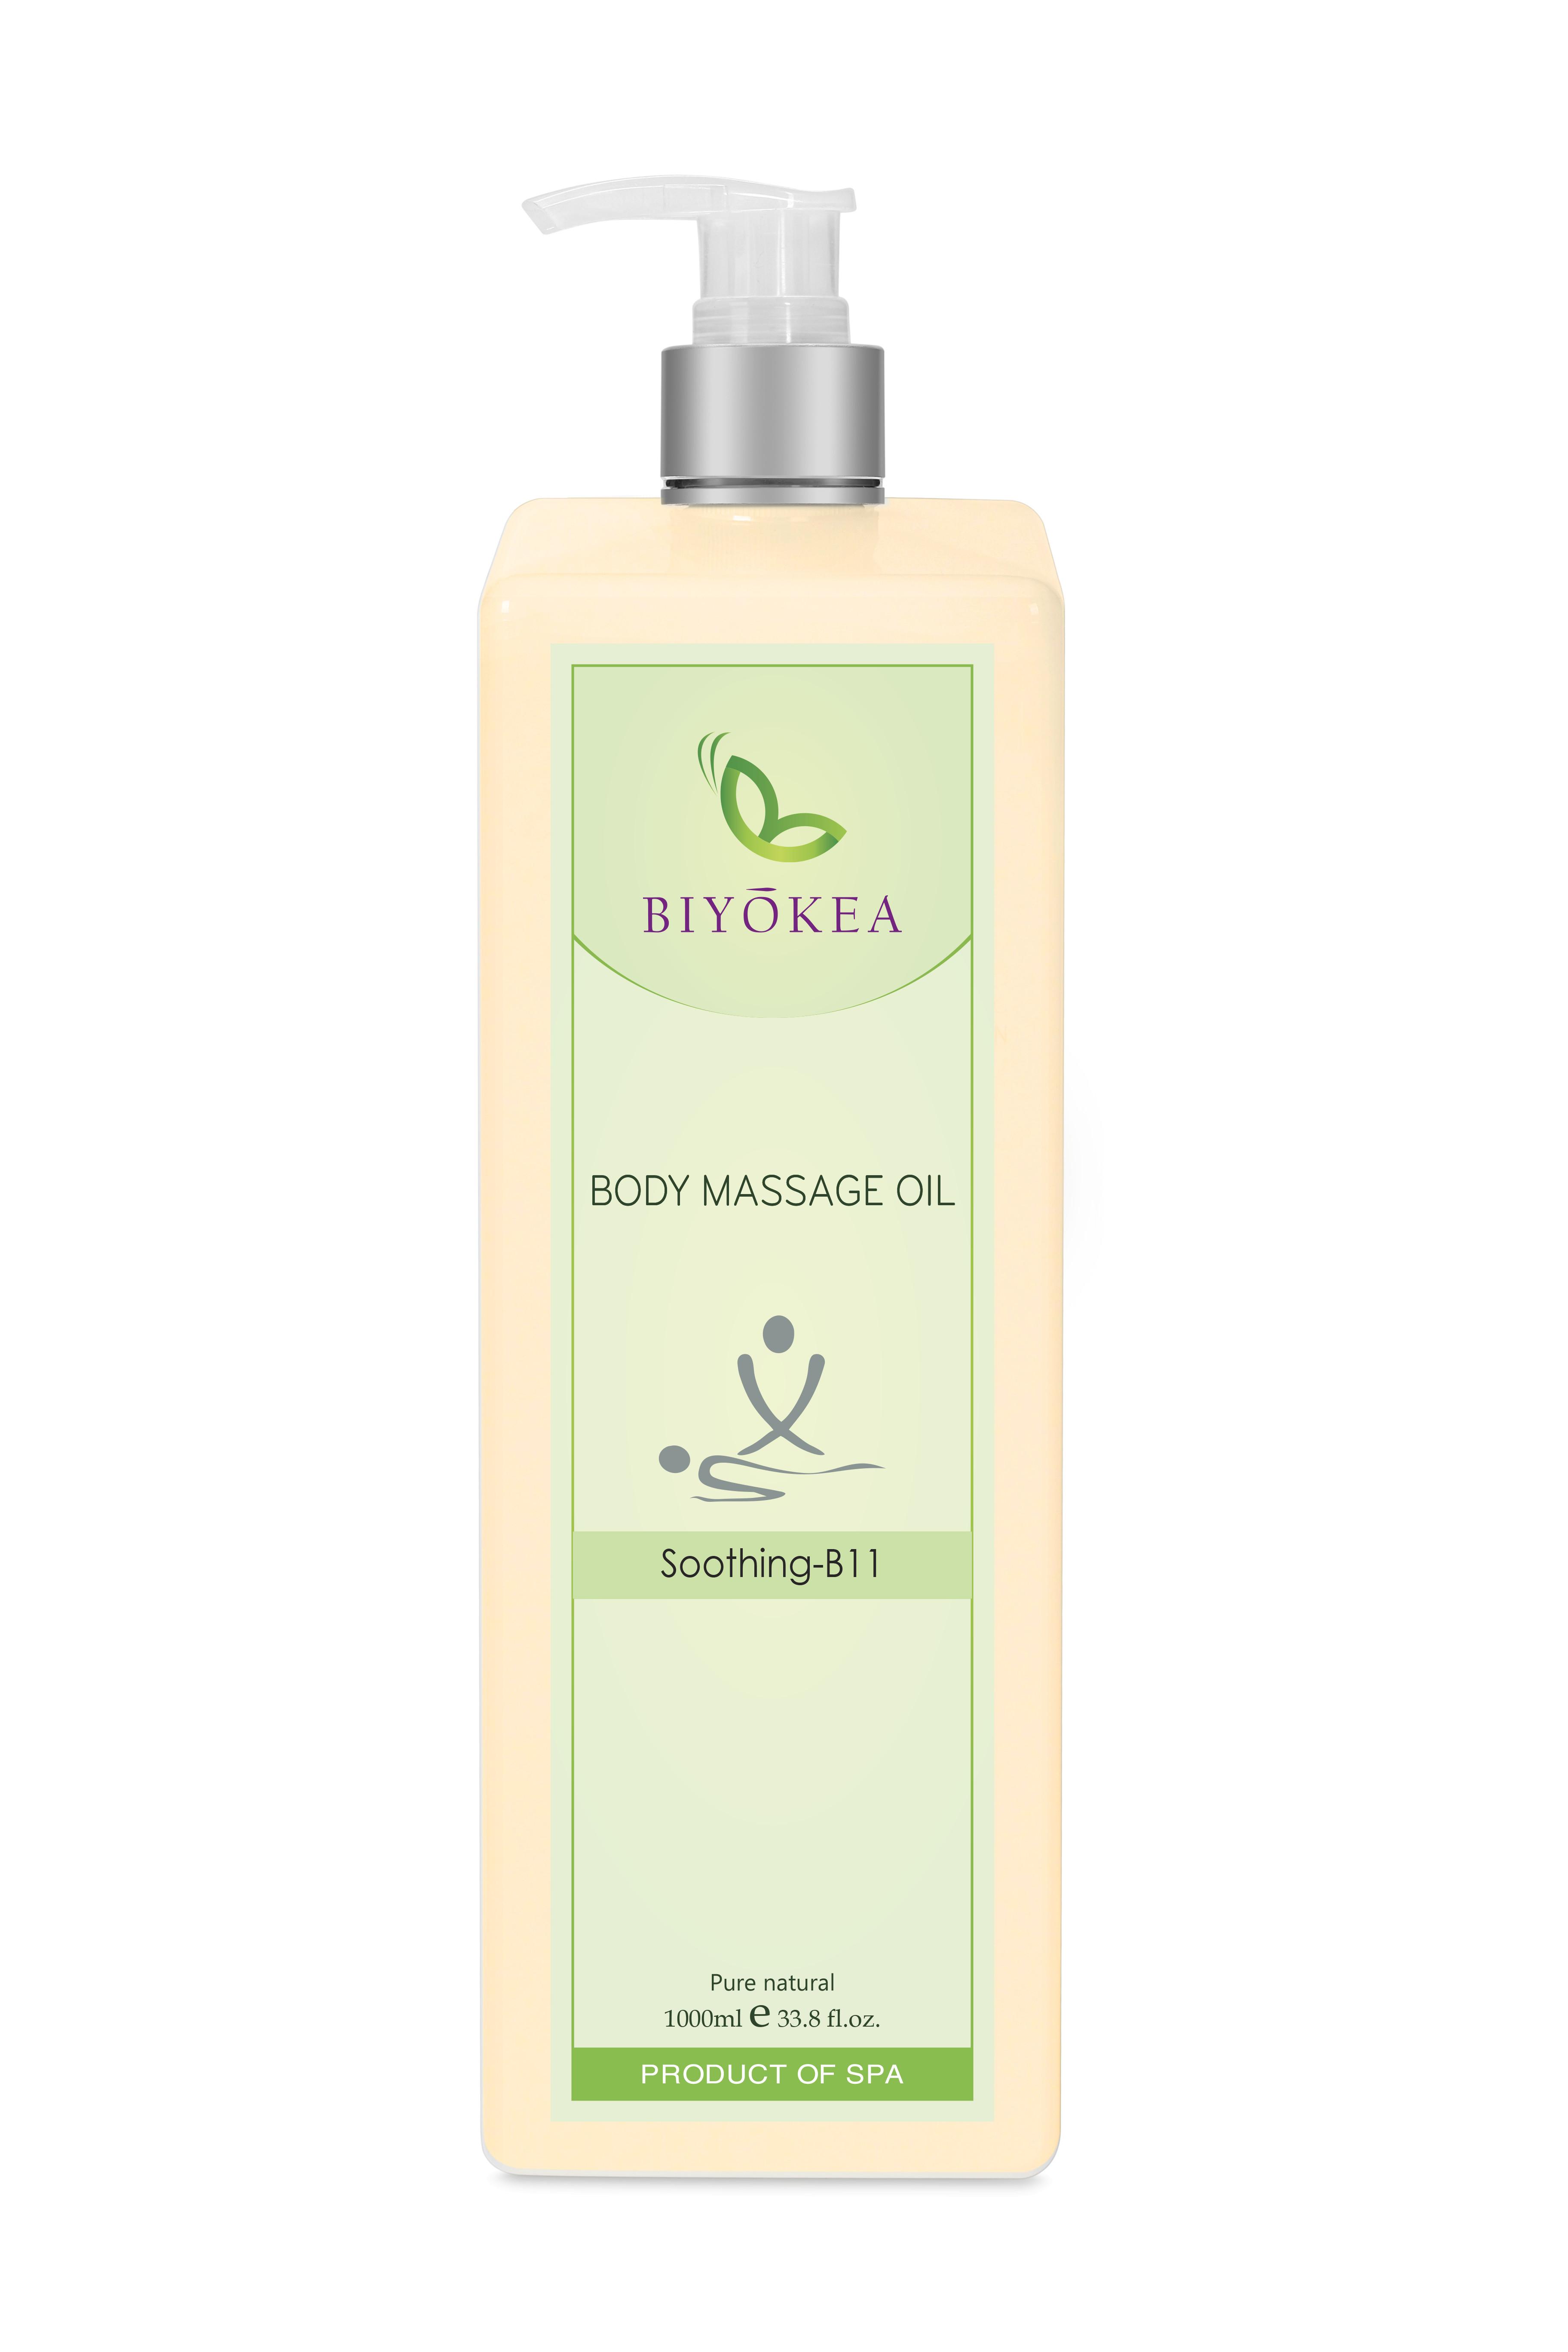 Dầu Massage Body Biyokea - Soothing B11 (làm dịu) - 1000ml